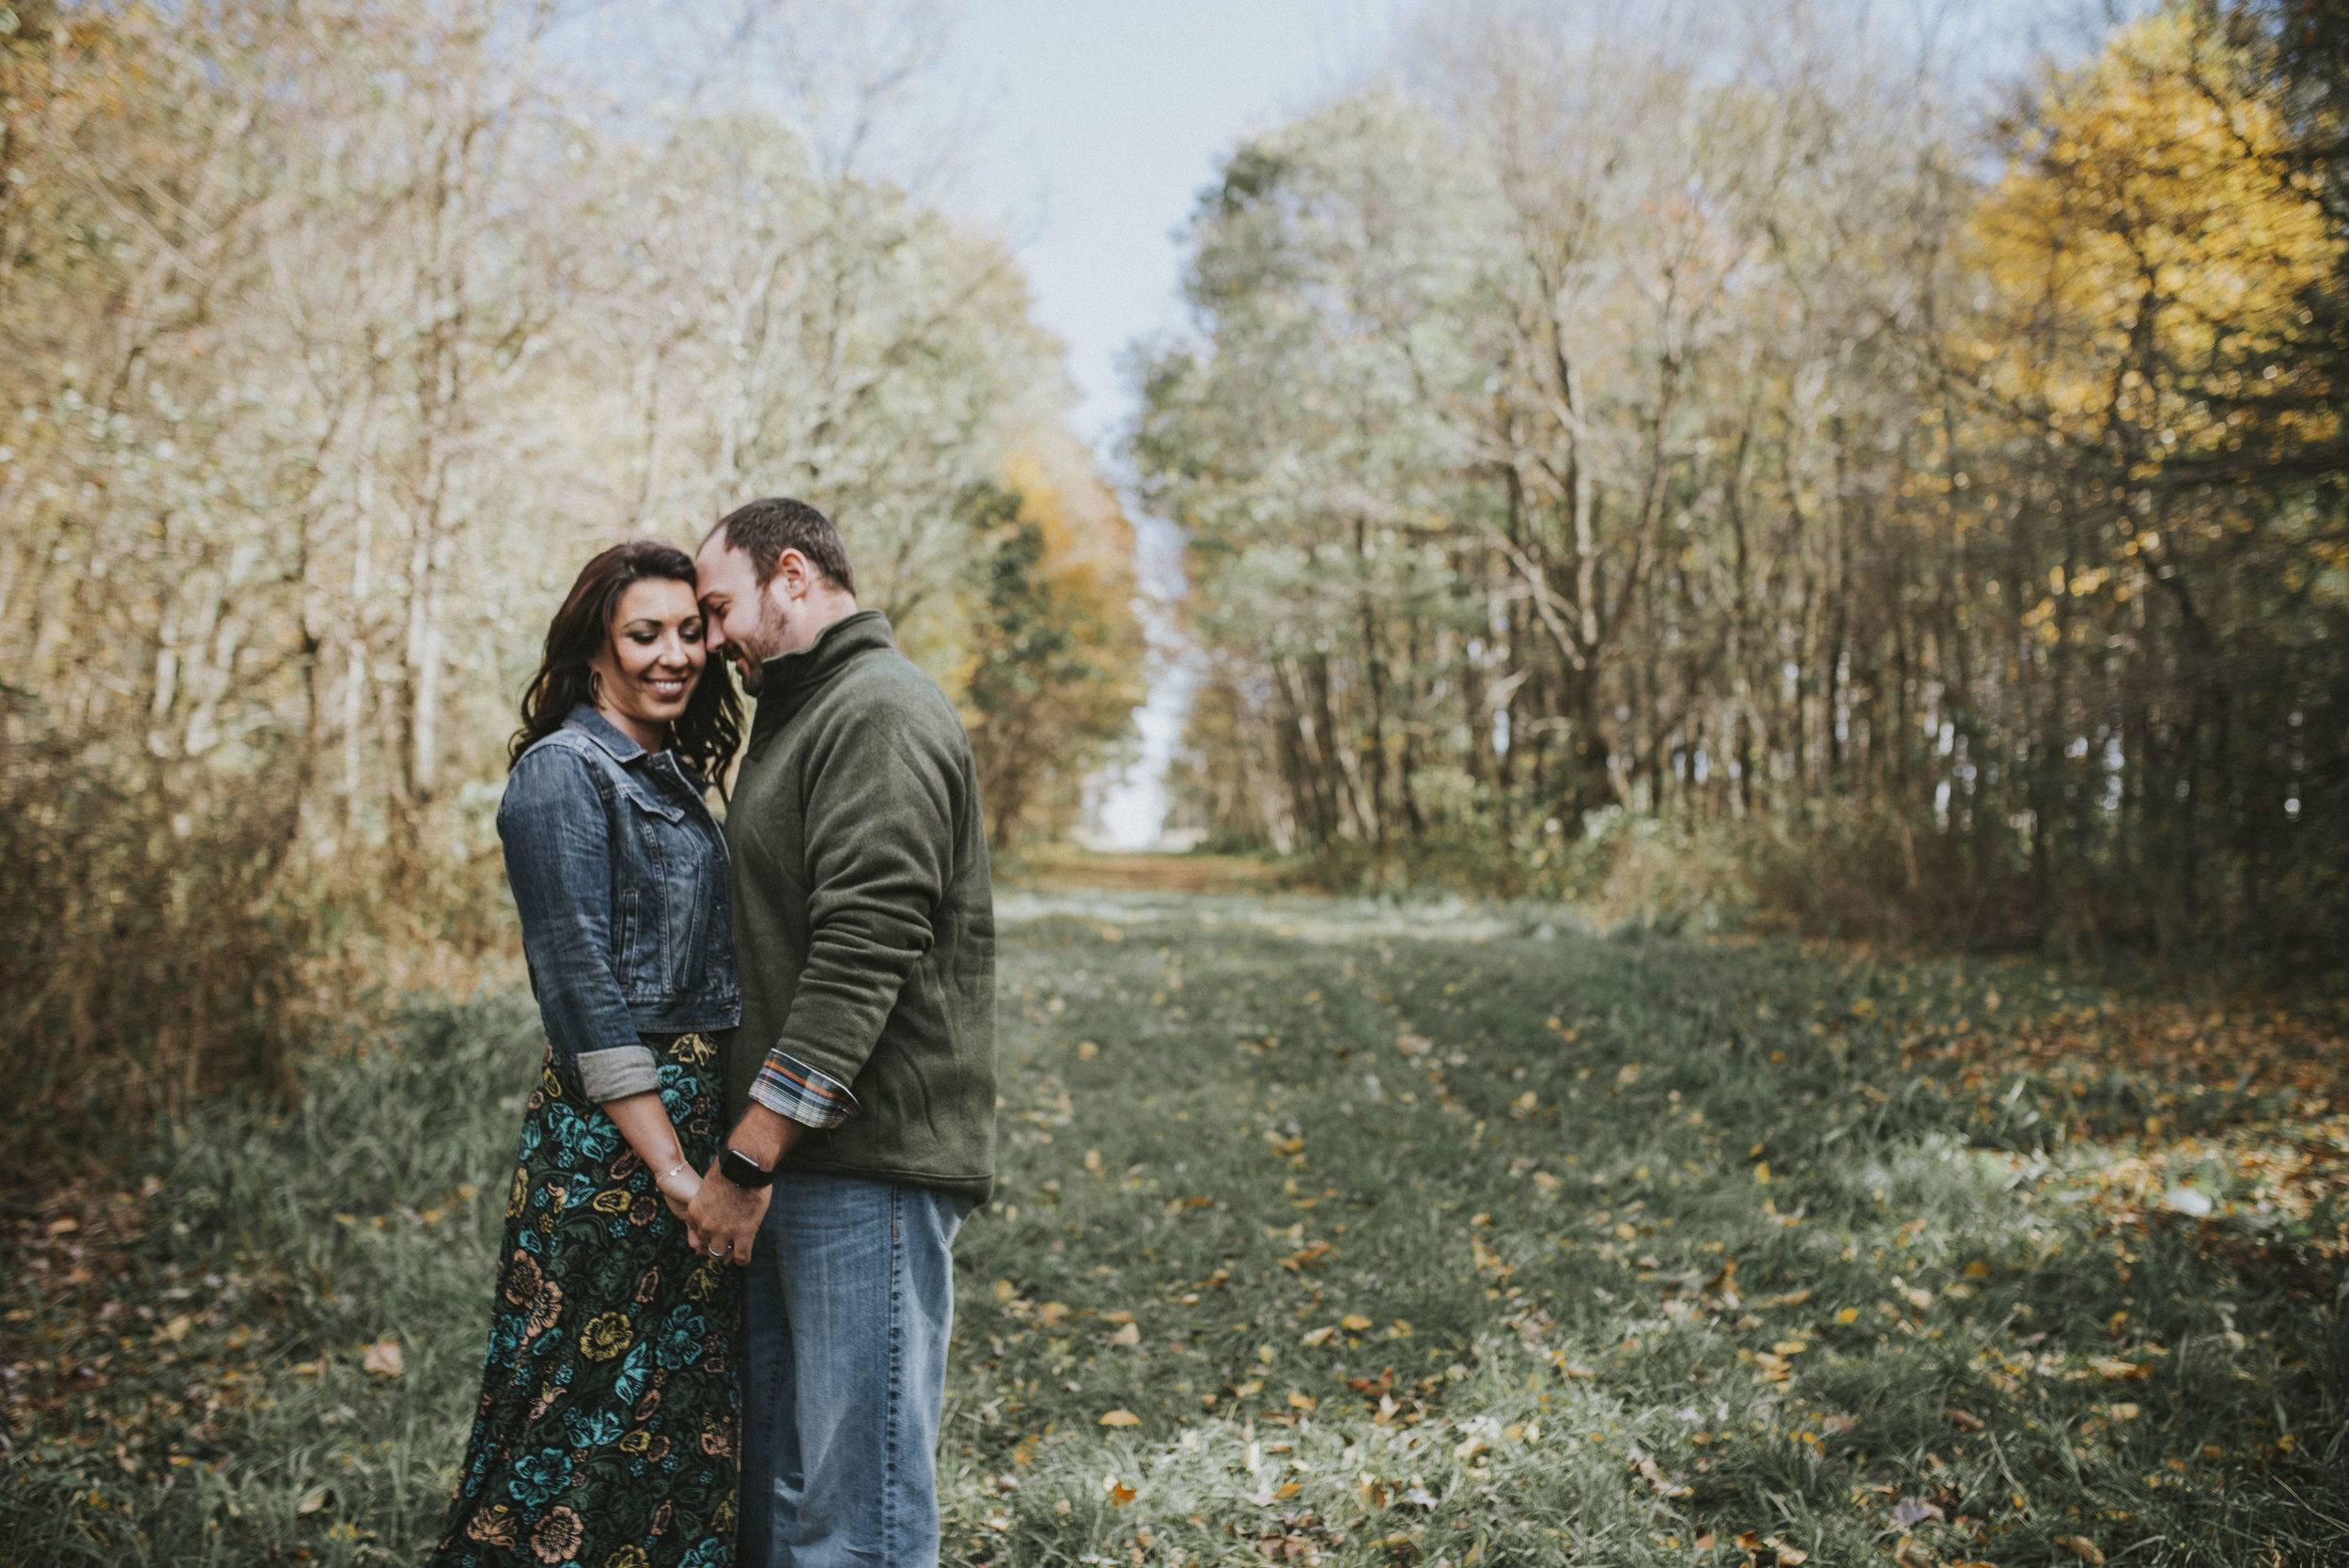 alternative wedding photographer   Sandrachile.com